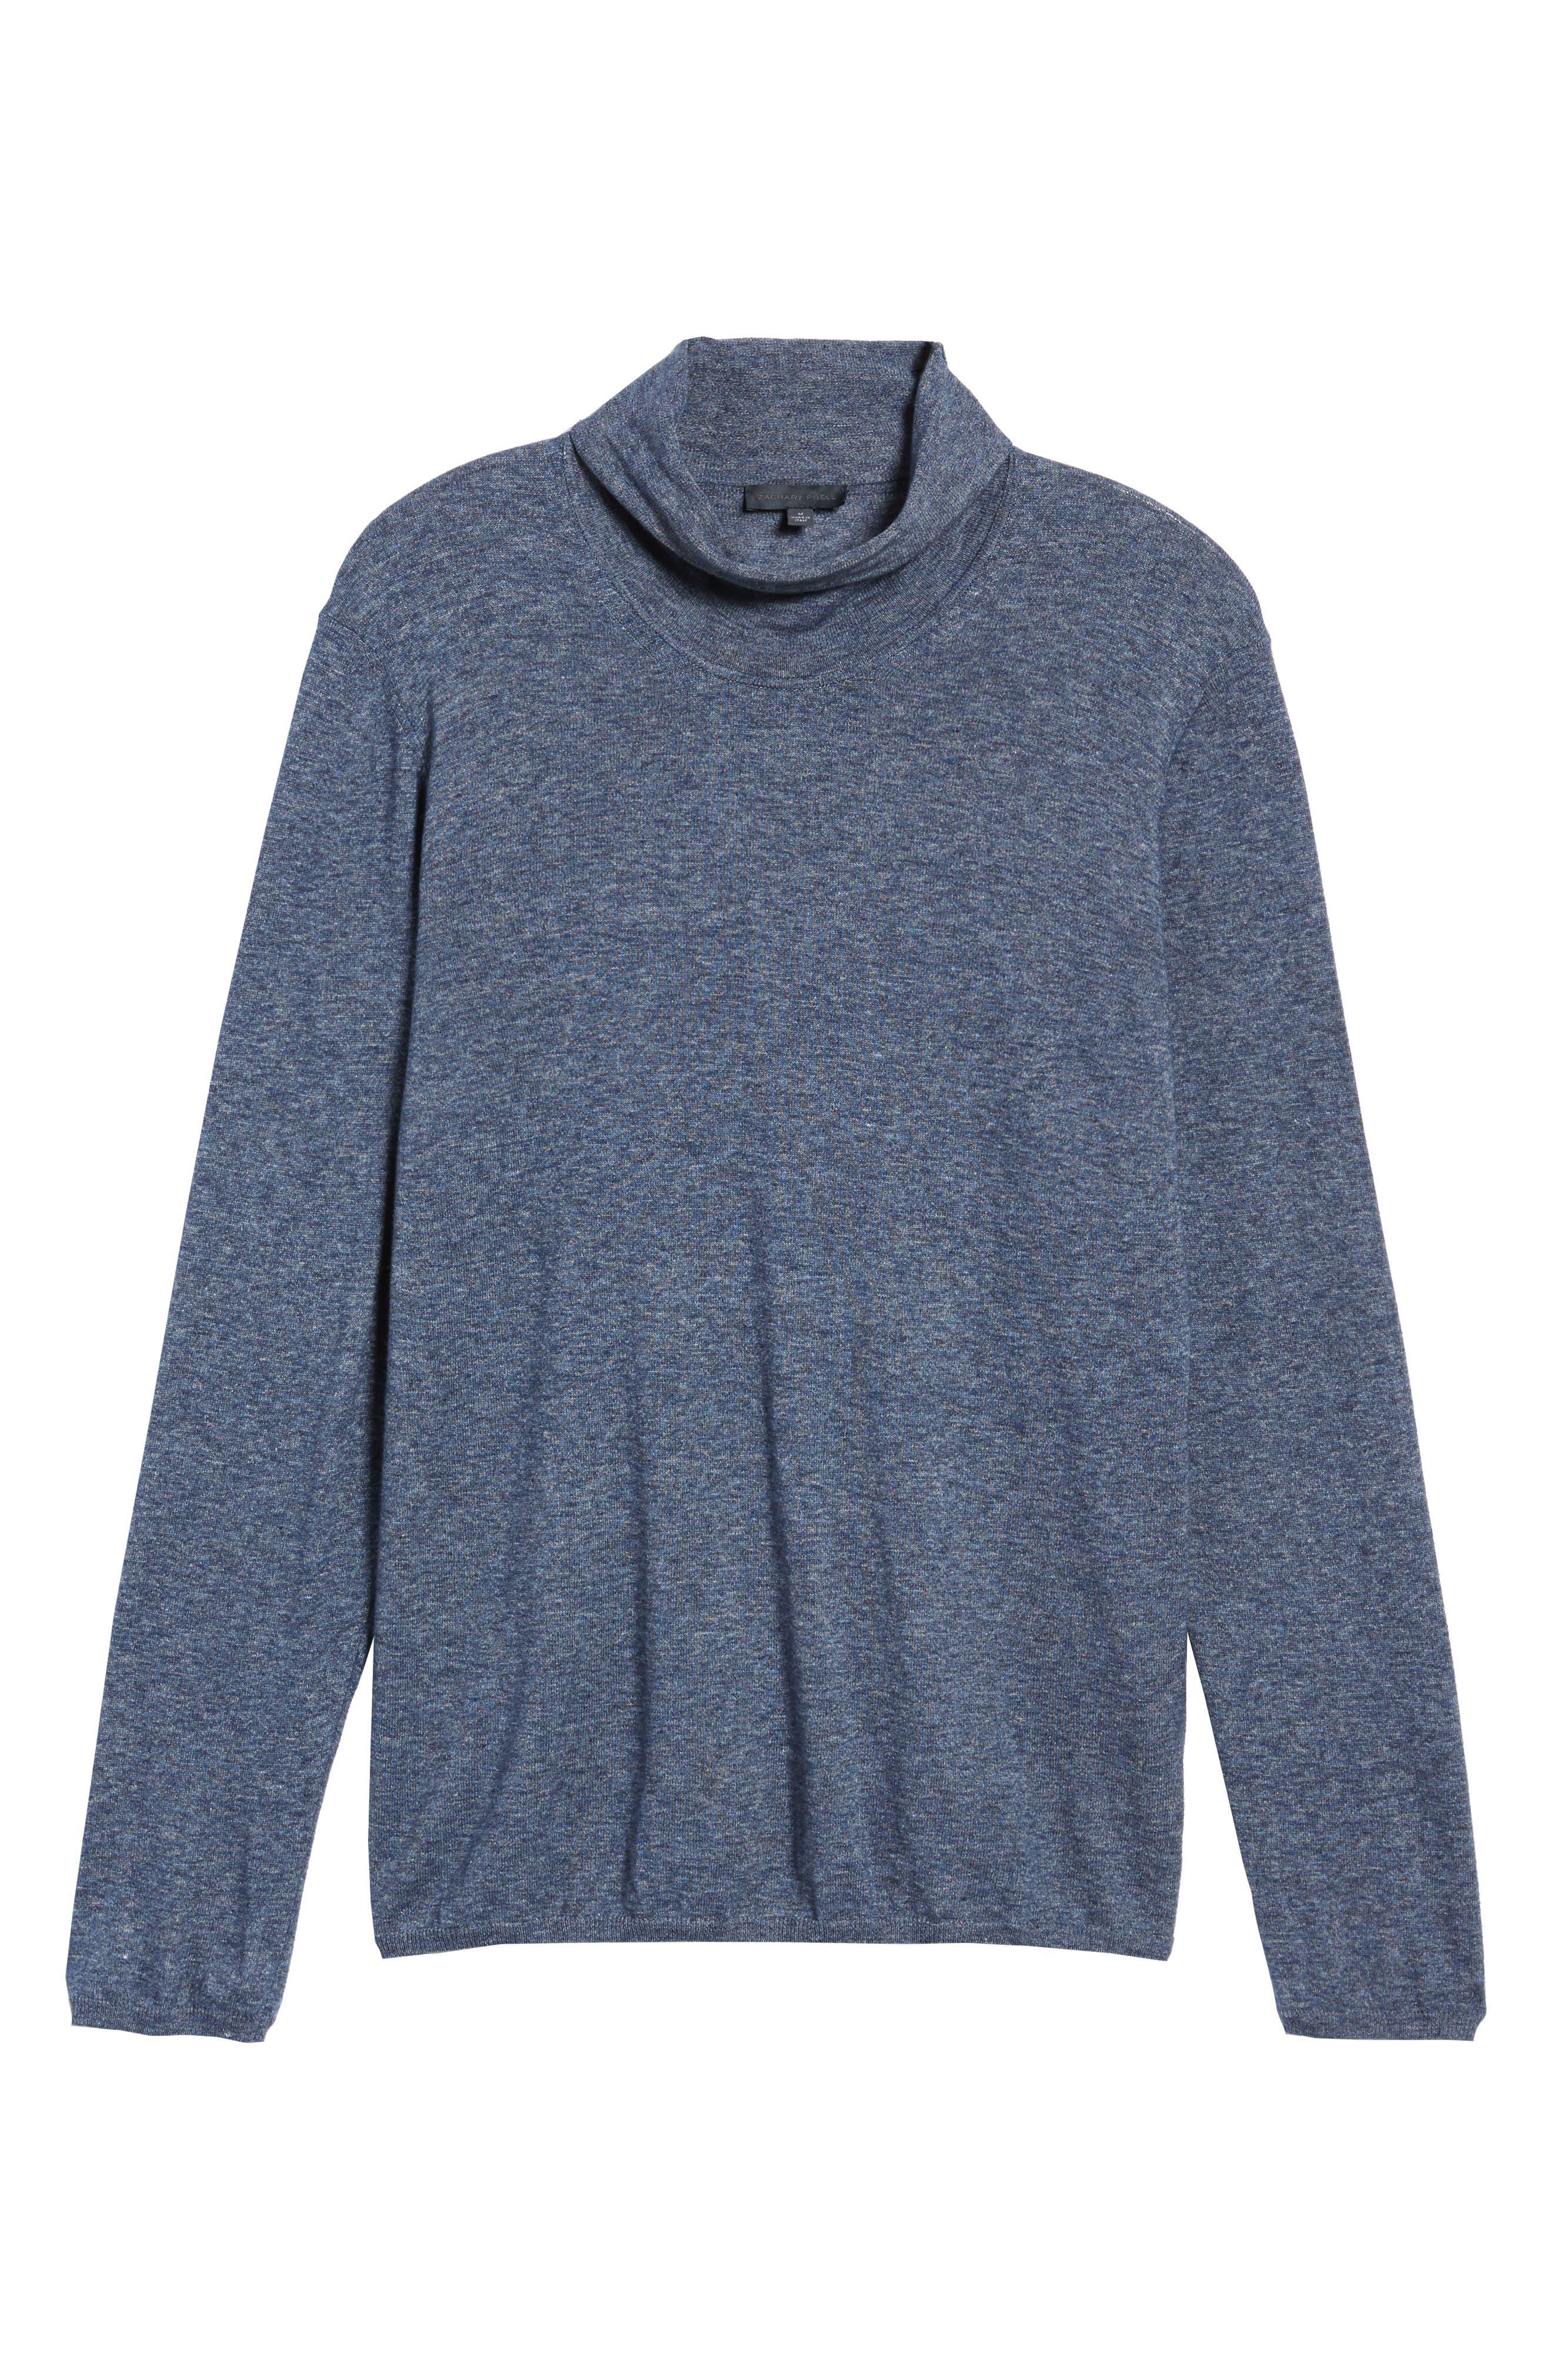 Hess Wool Turtleneck Sweater,                             Alternate thumbnail 12, color,